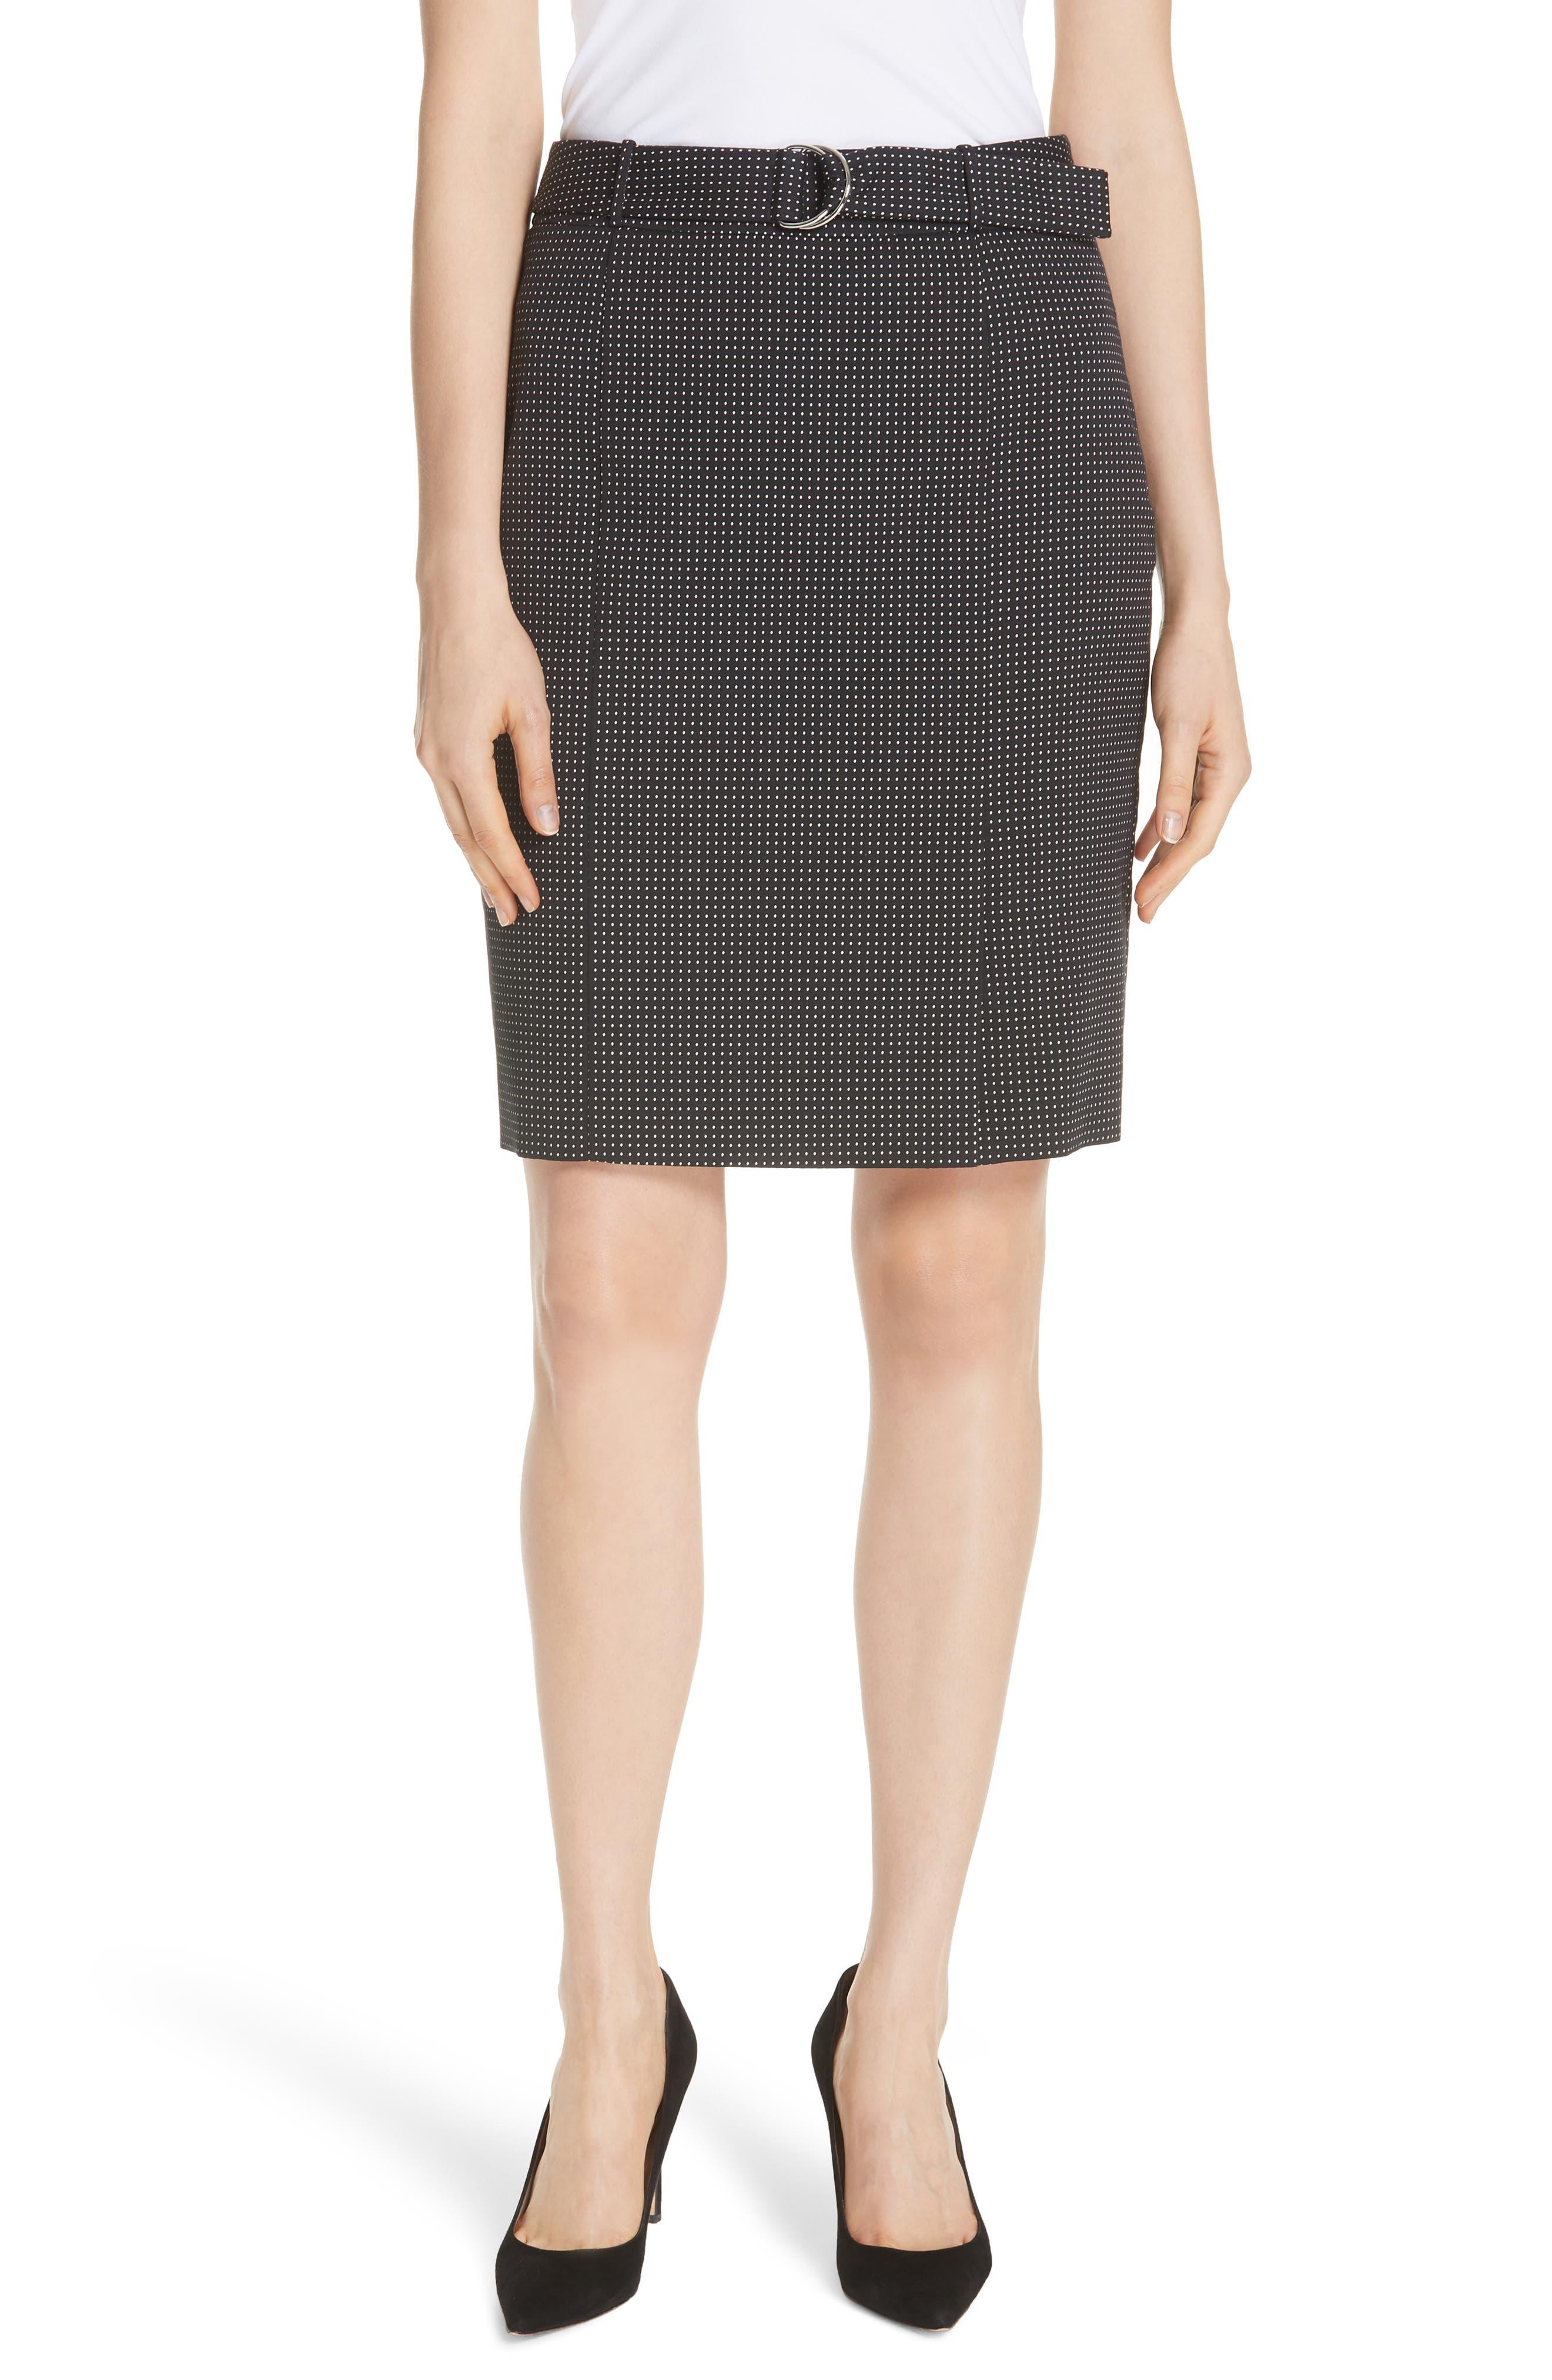 Vumano Dot Dessin Stretch Suit Skirt,                         Main,                         color, BLACK FANTASY